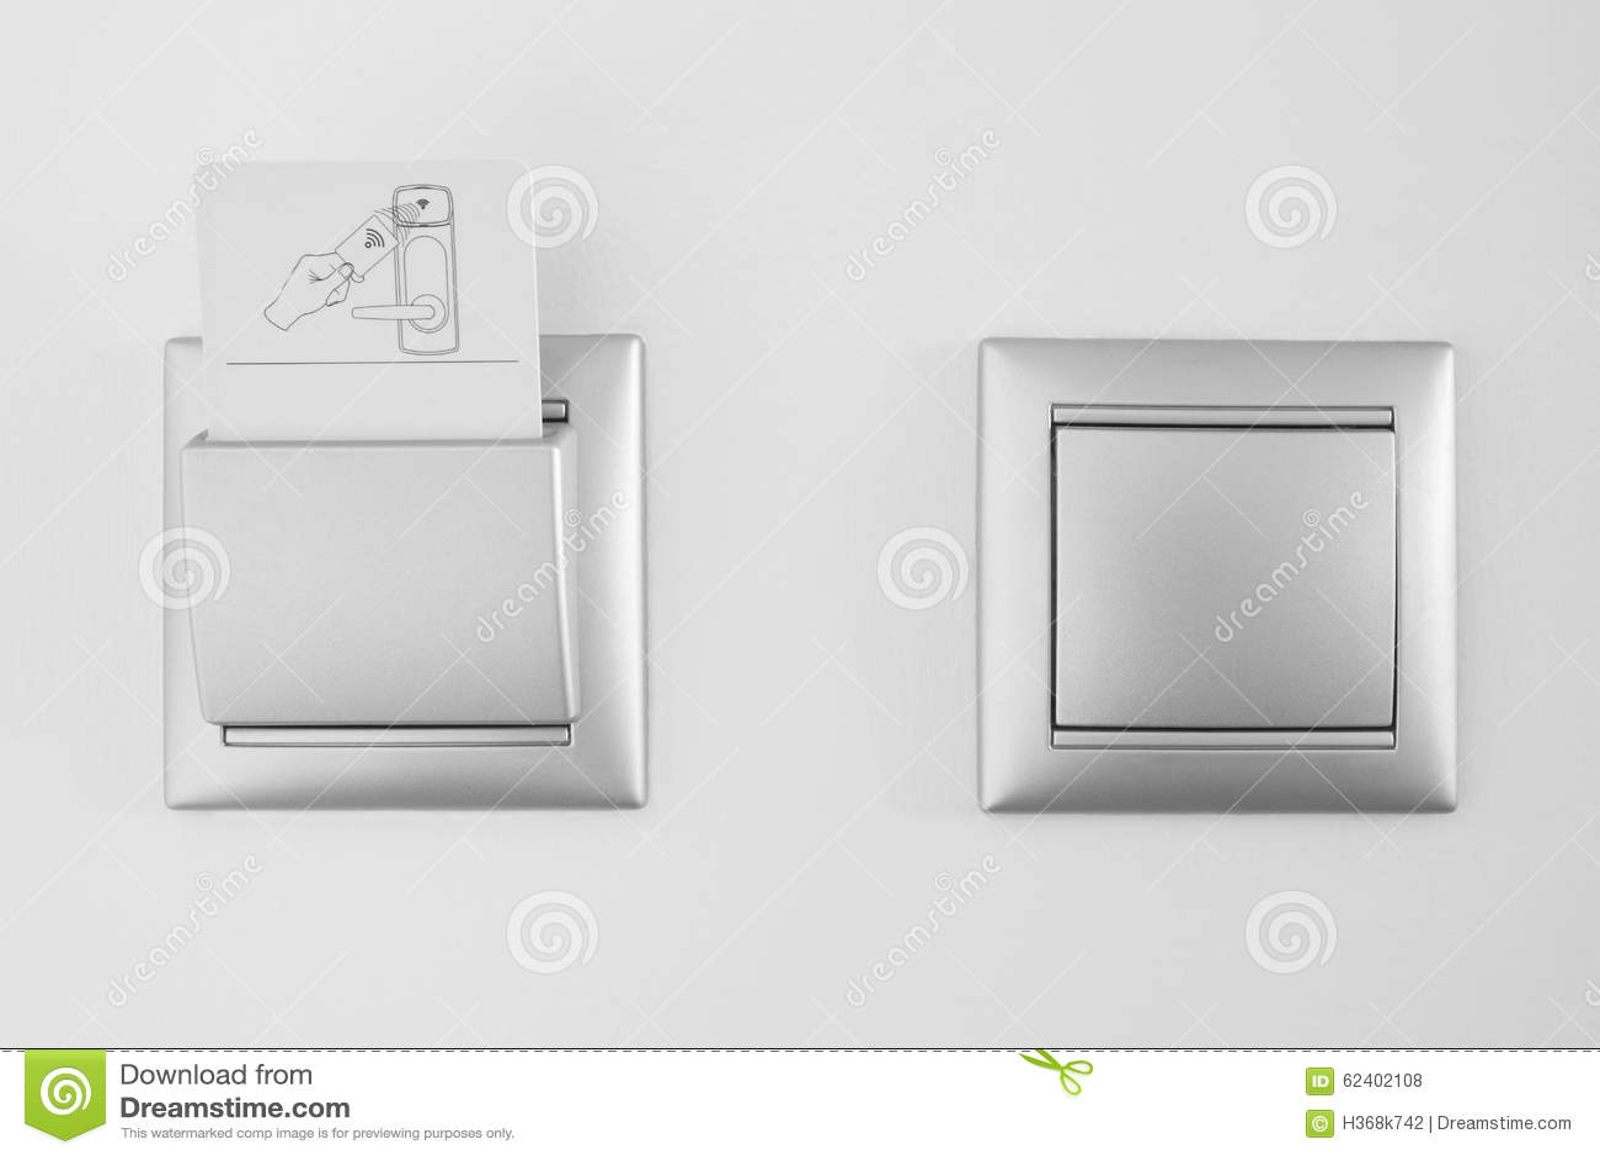 Hotel Room Key Card Wall Slots